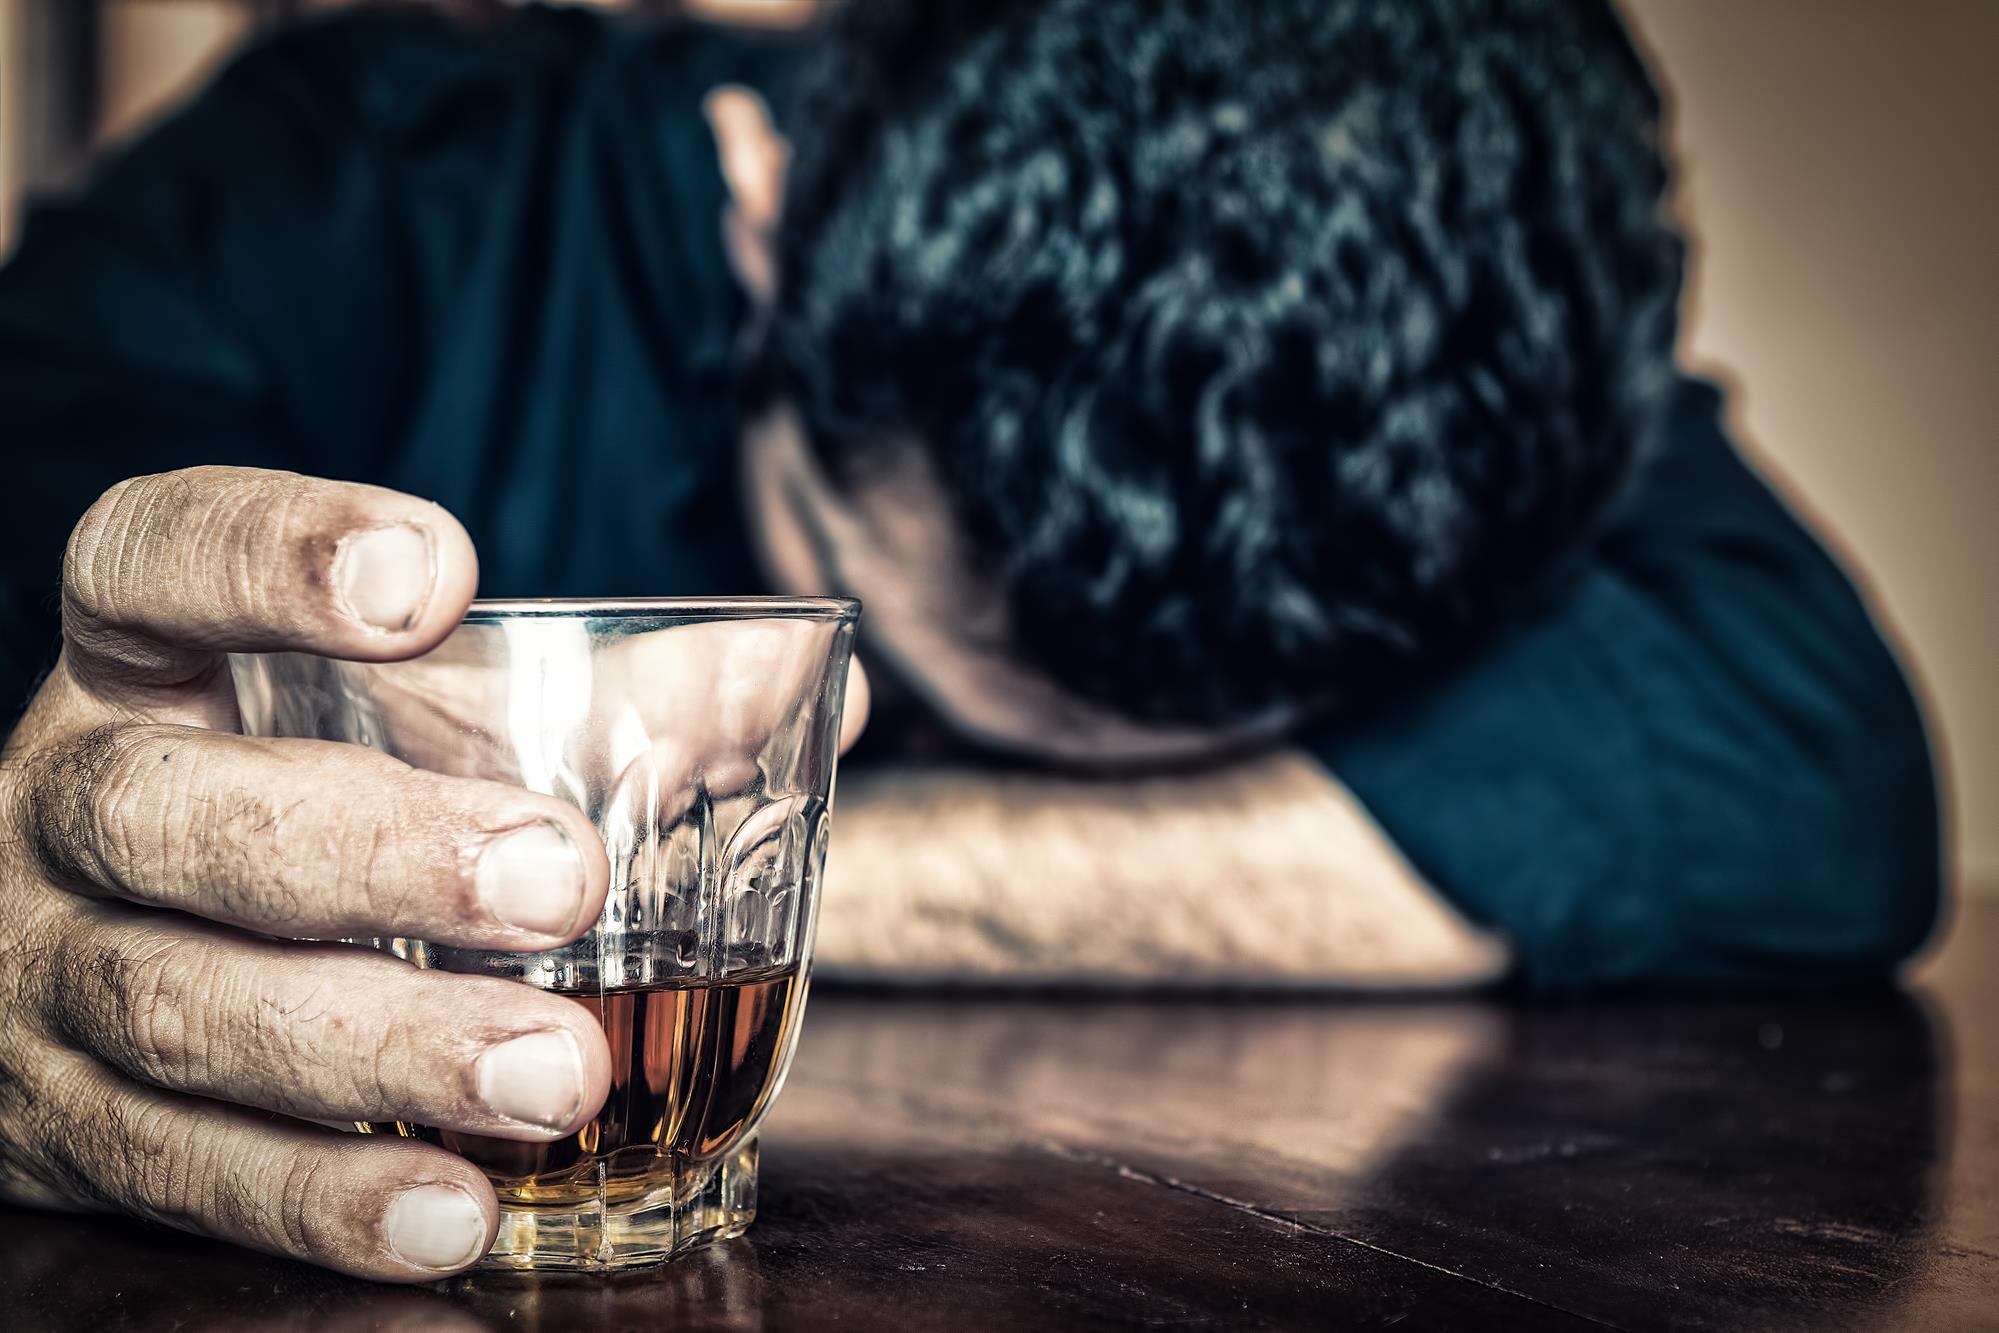 Pijany mężczyzna alkoholik leży na stole ze szklanką z alkoholem.